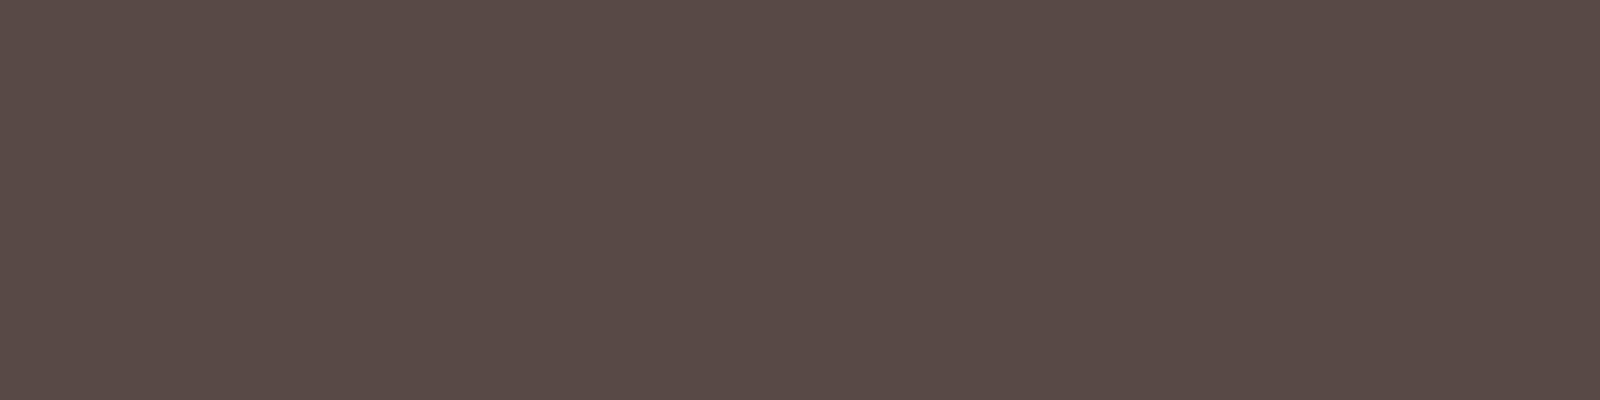 250 Musket Brown Gutter Color